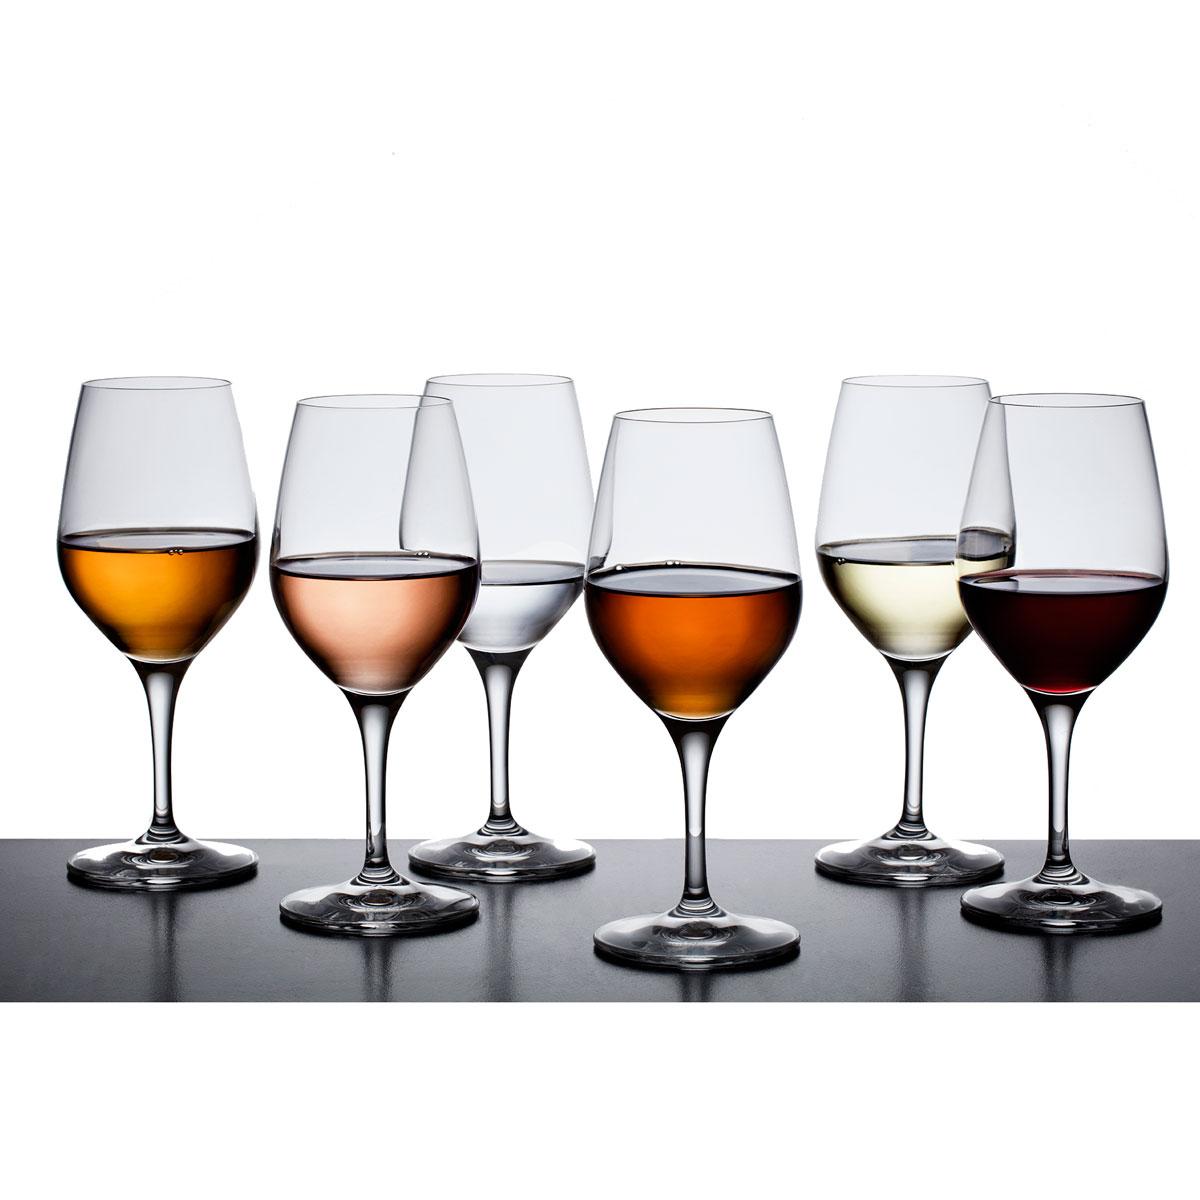 Orrefors Crystal Sense Universal Wine Glasses, Set of 6